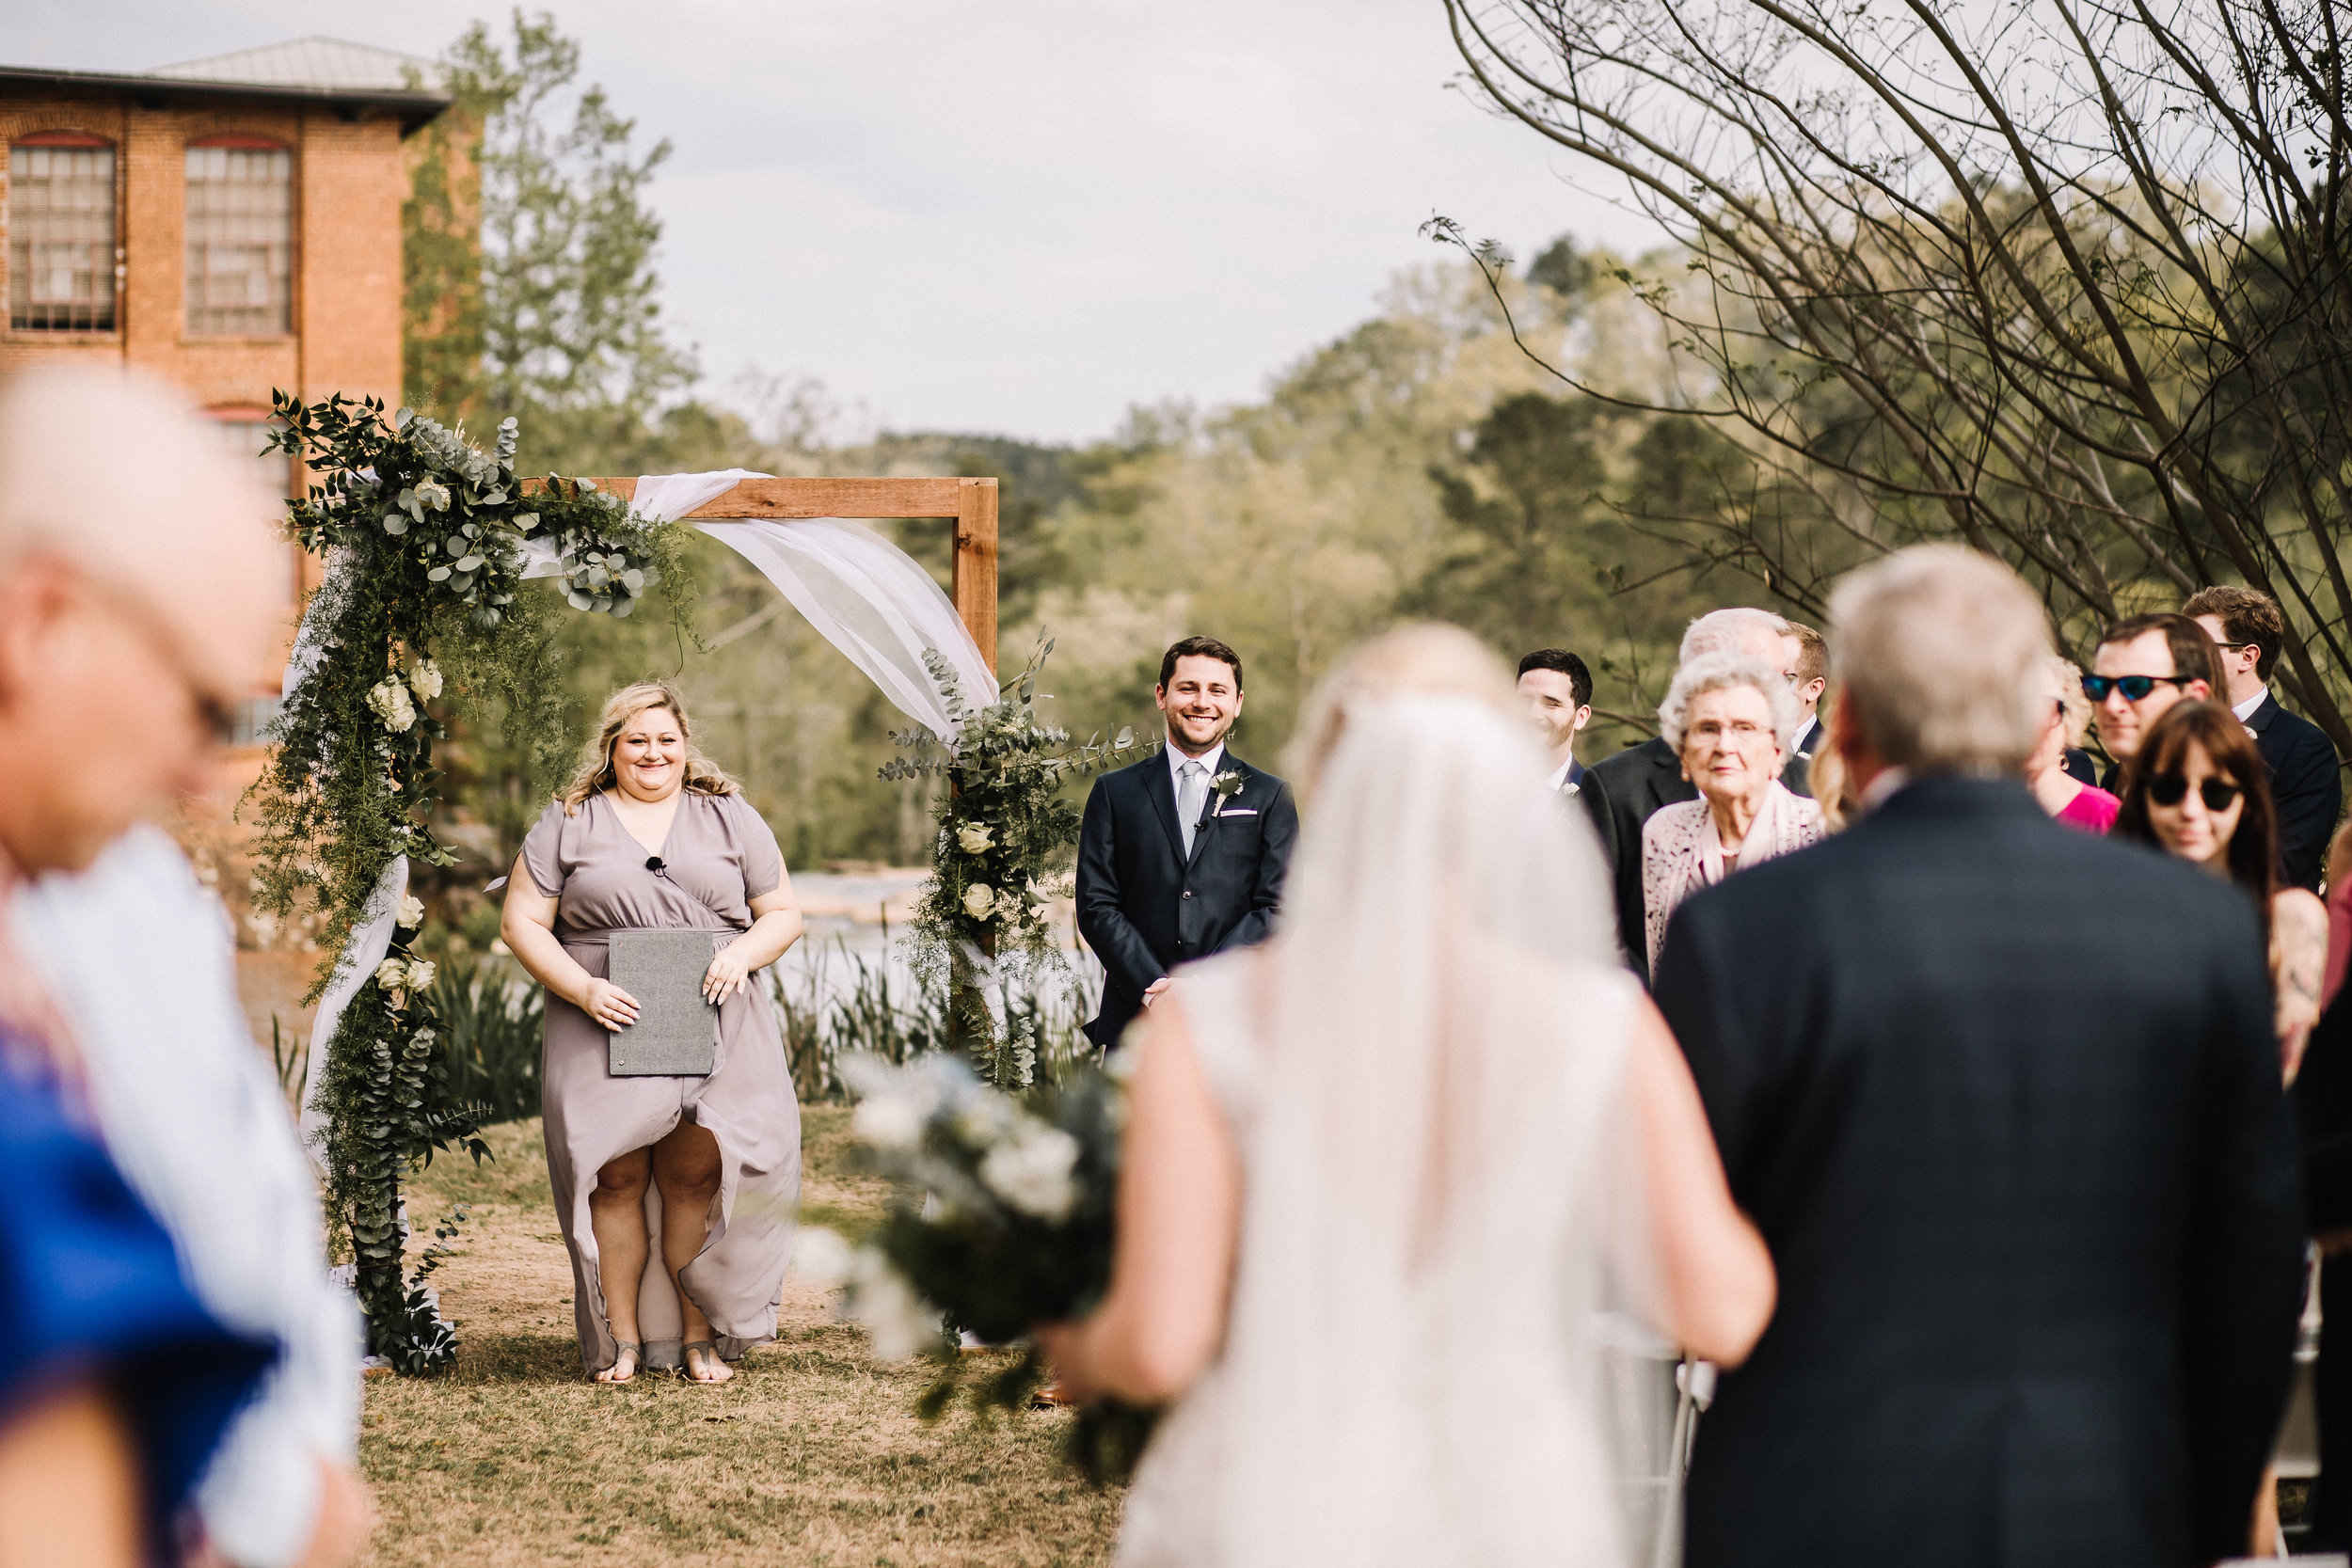 Morgan Wedding_Mill at Yellow River_Ashley Benham Photography-554.jpg